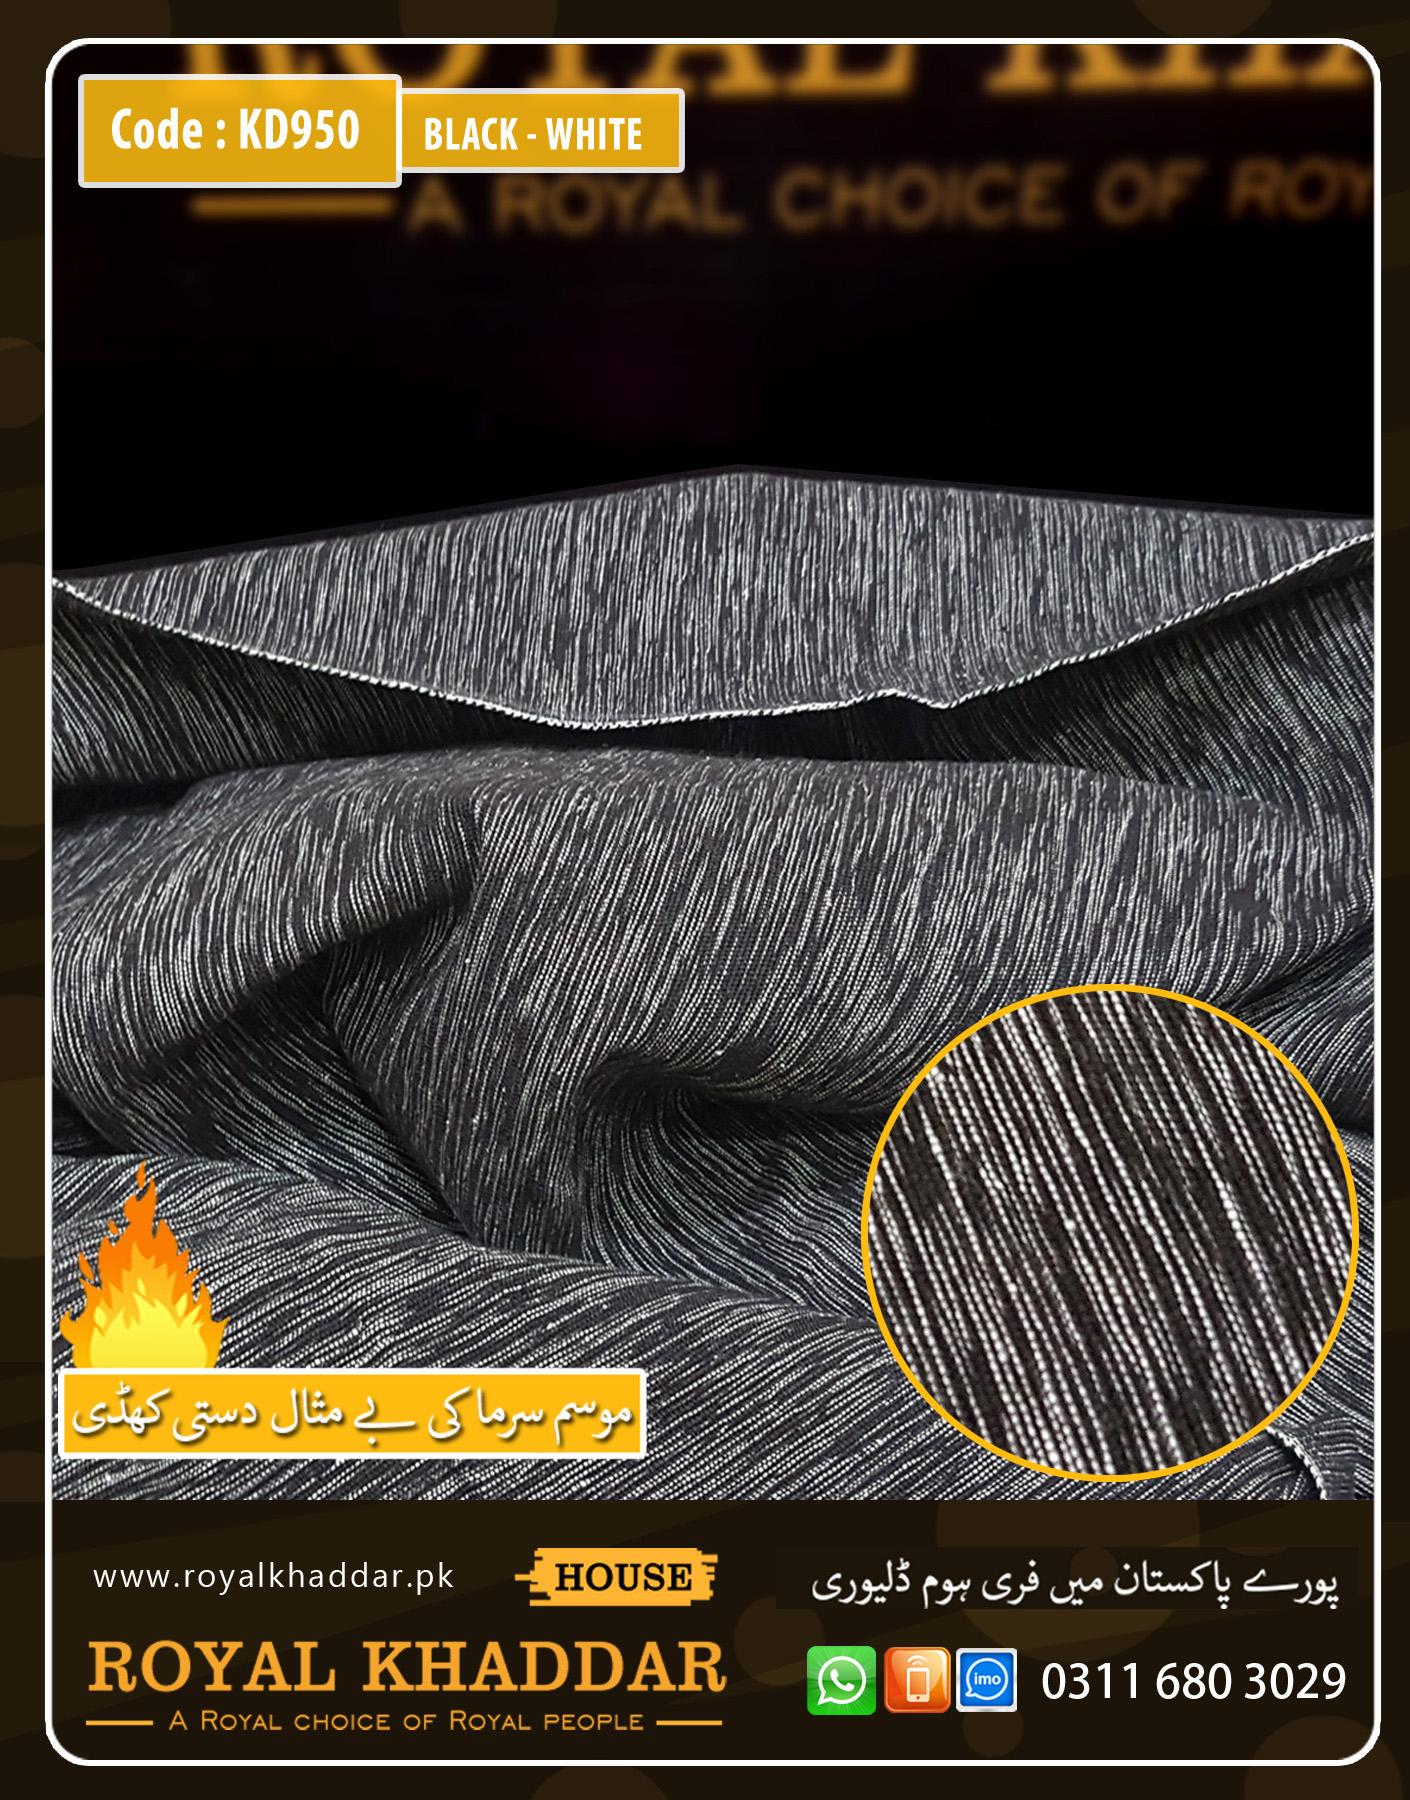 KD950 Black - White Handmade Khaddi